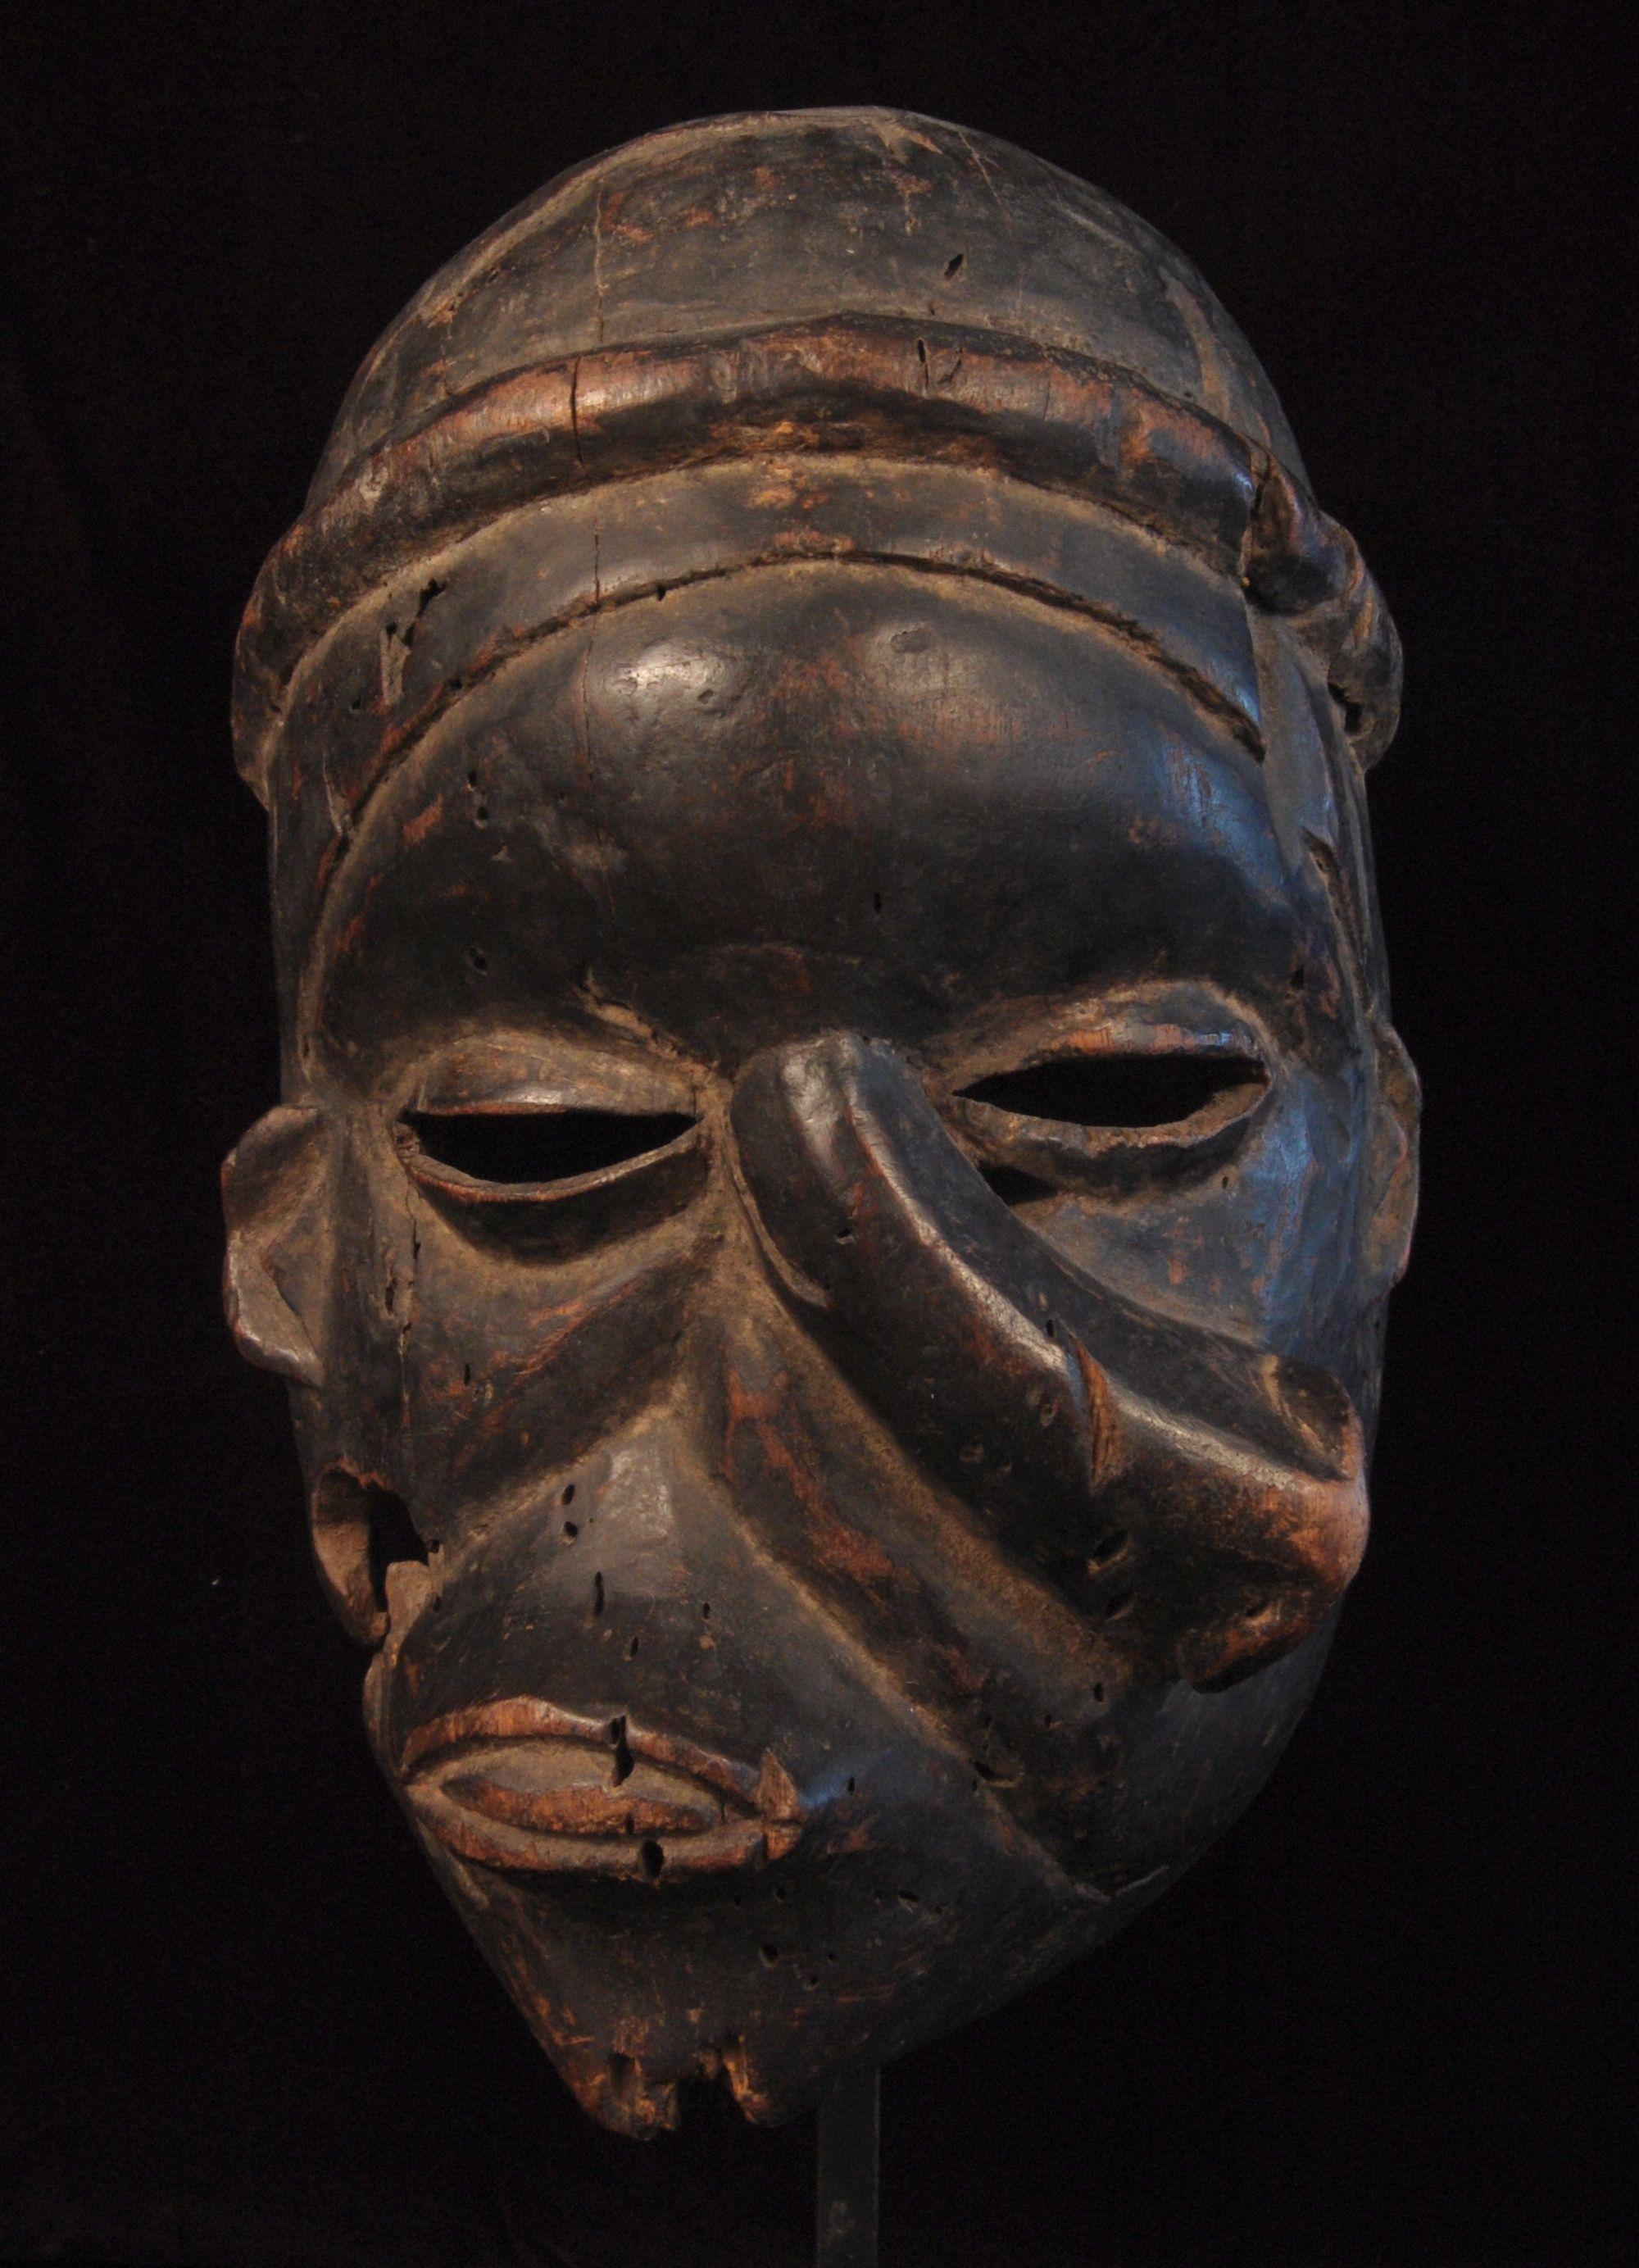 Ibibio Deformation Mask,  Nigeria  Height: 11 inches.